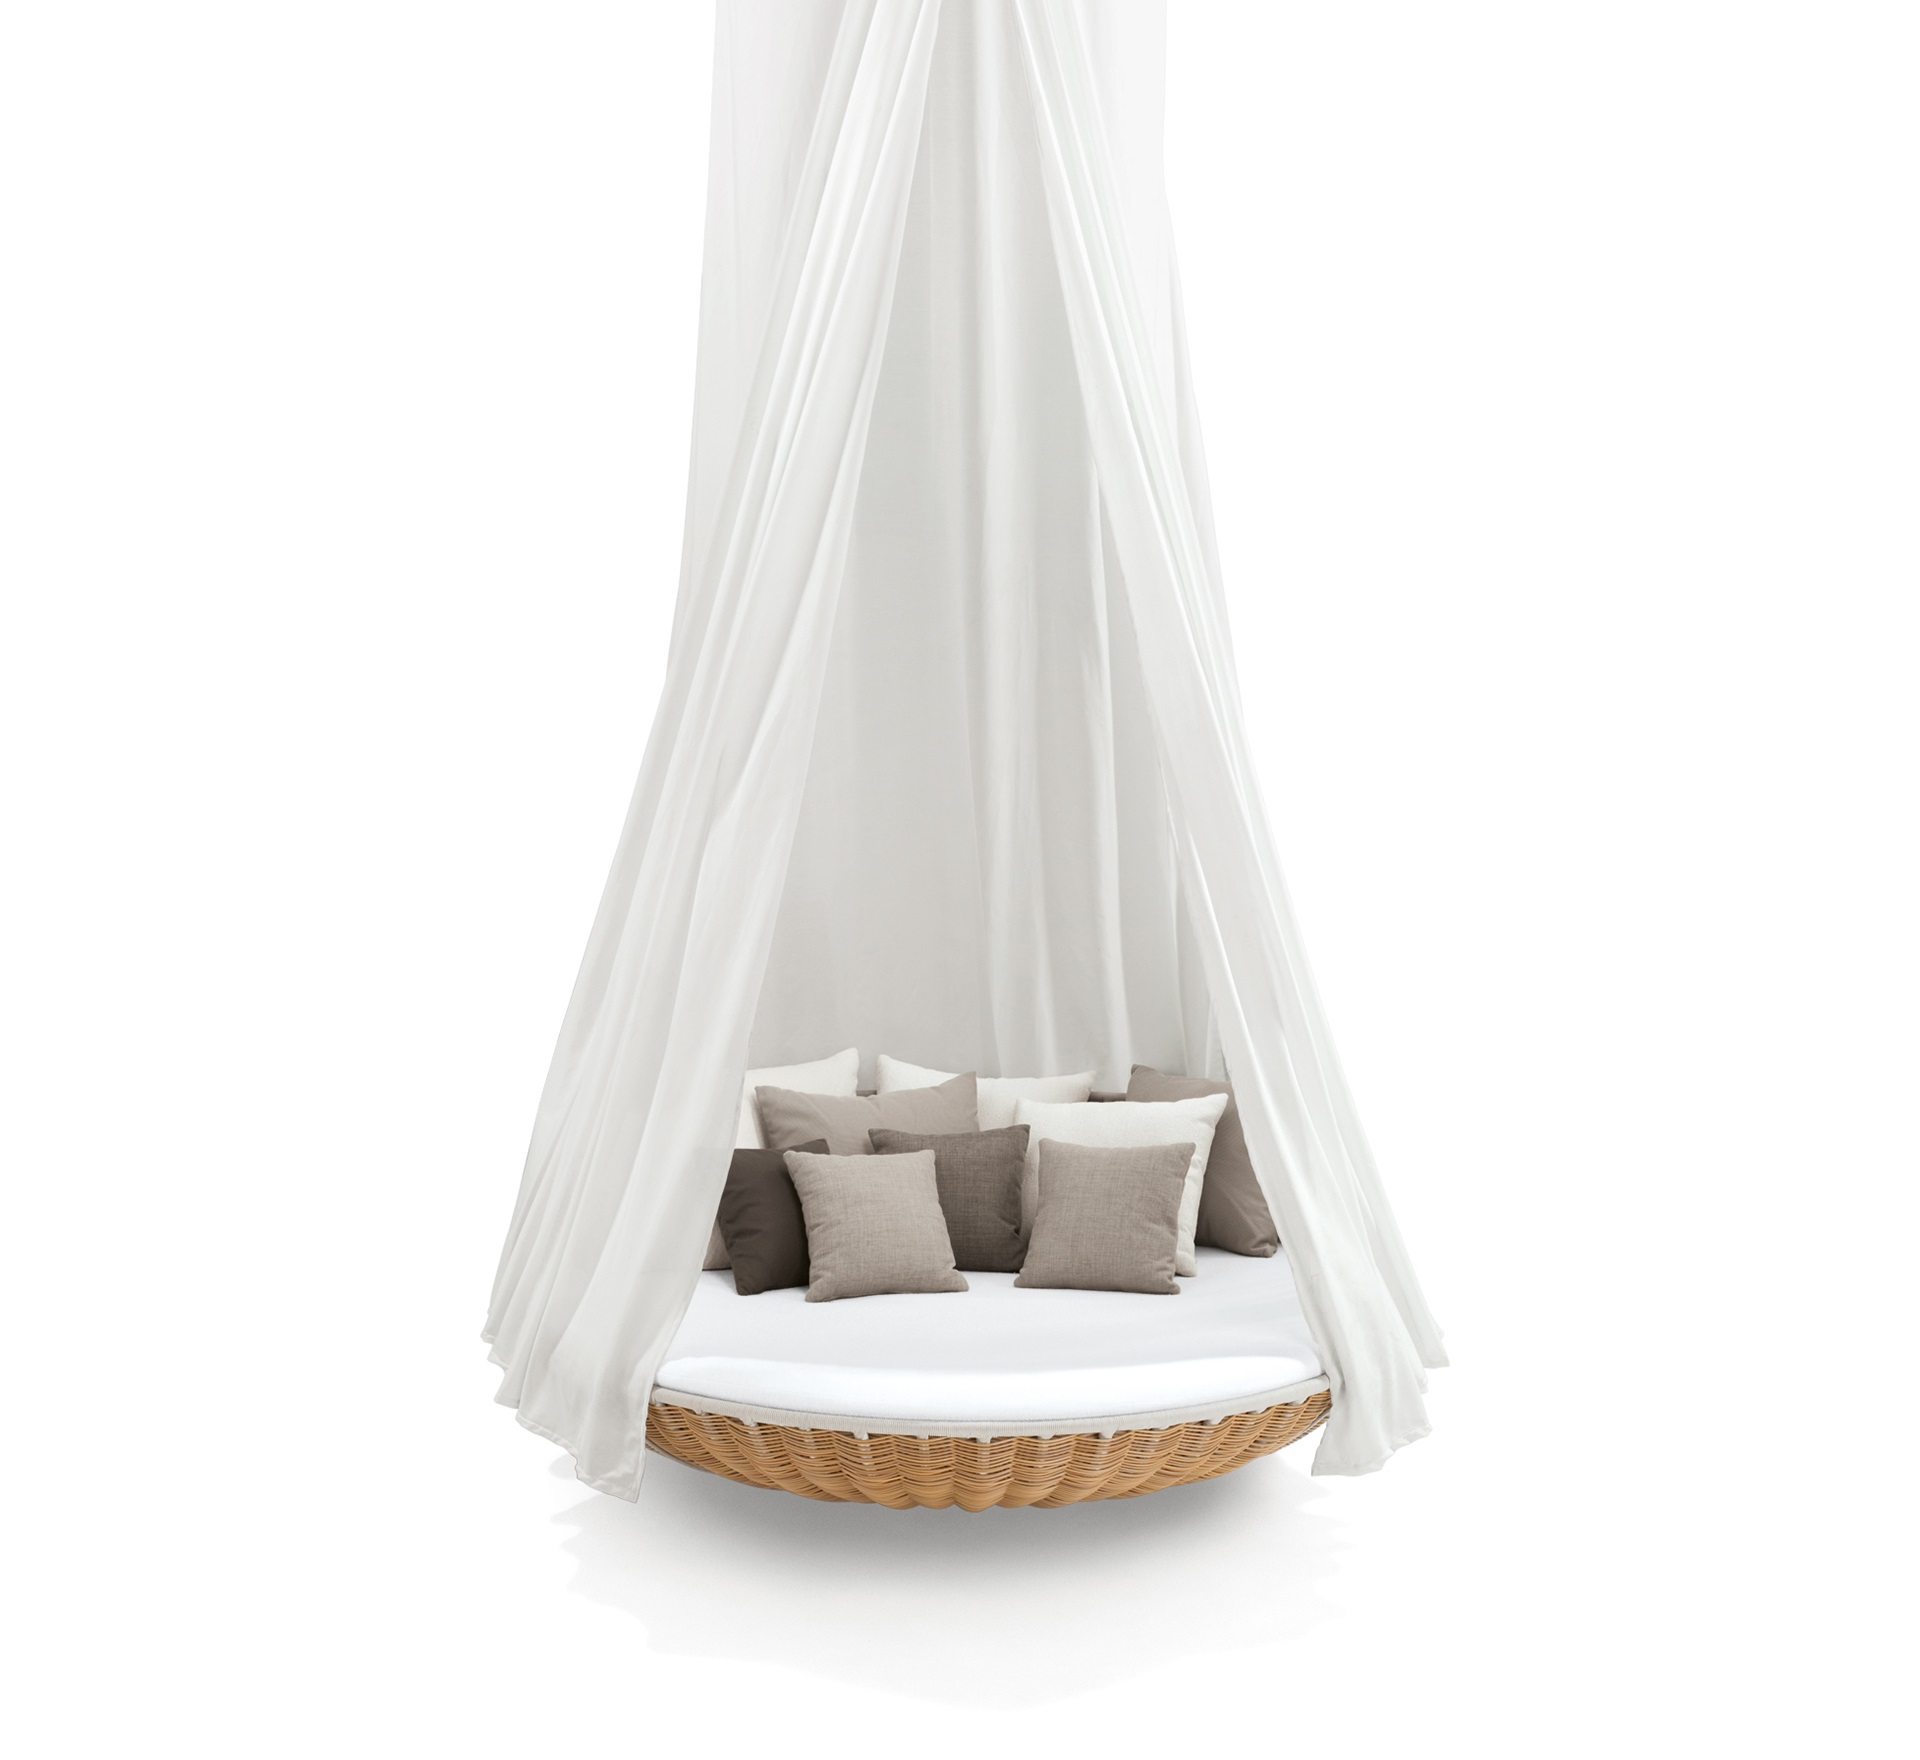 Dedon Swingrest Canopy For Hanging Lounger